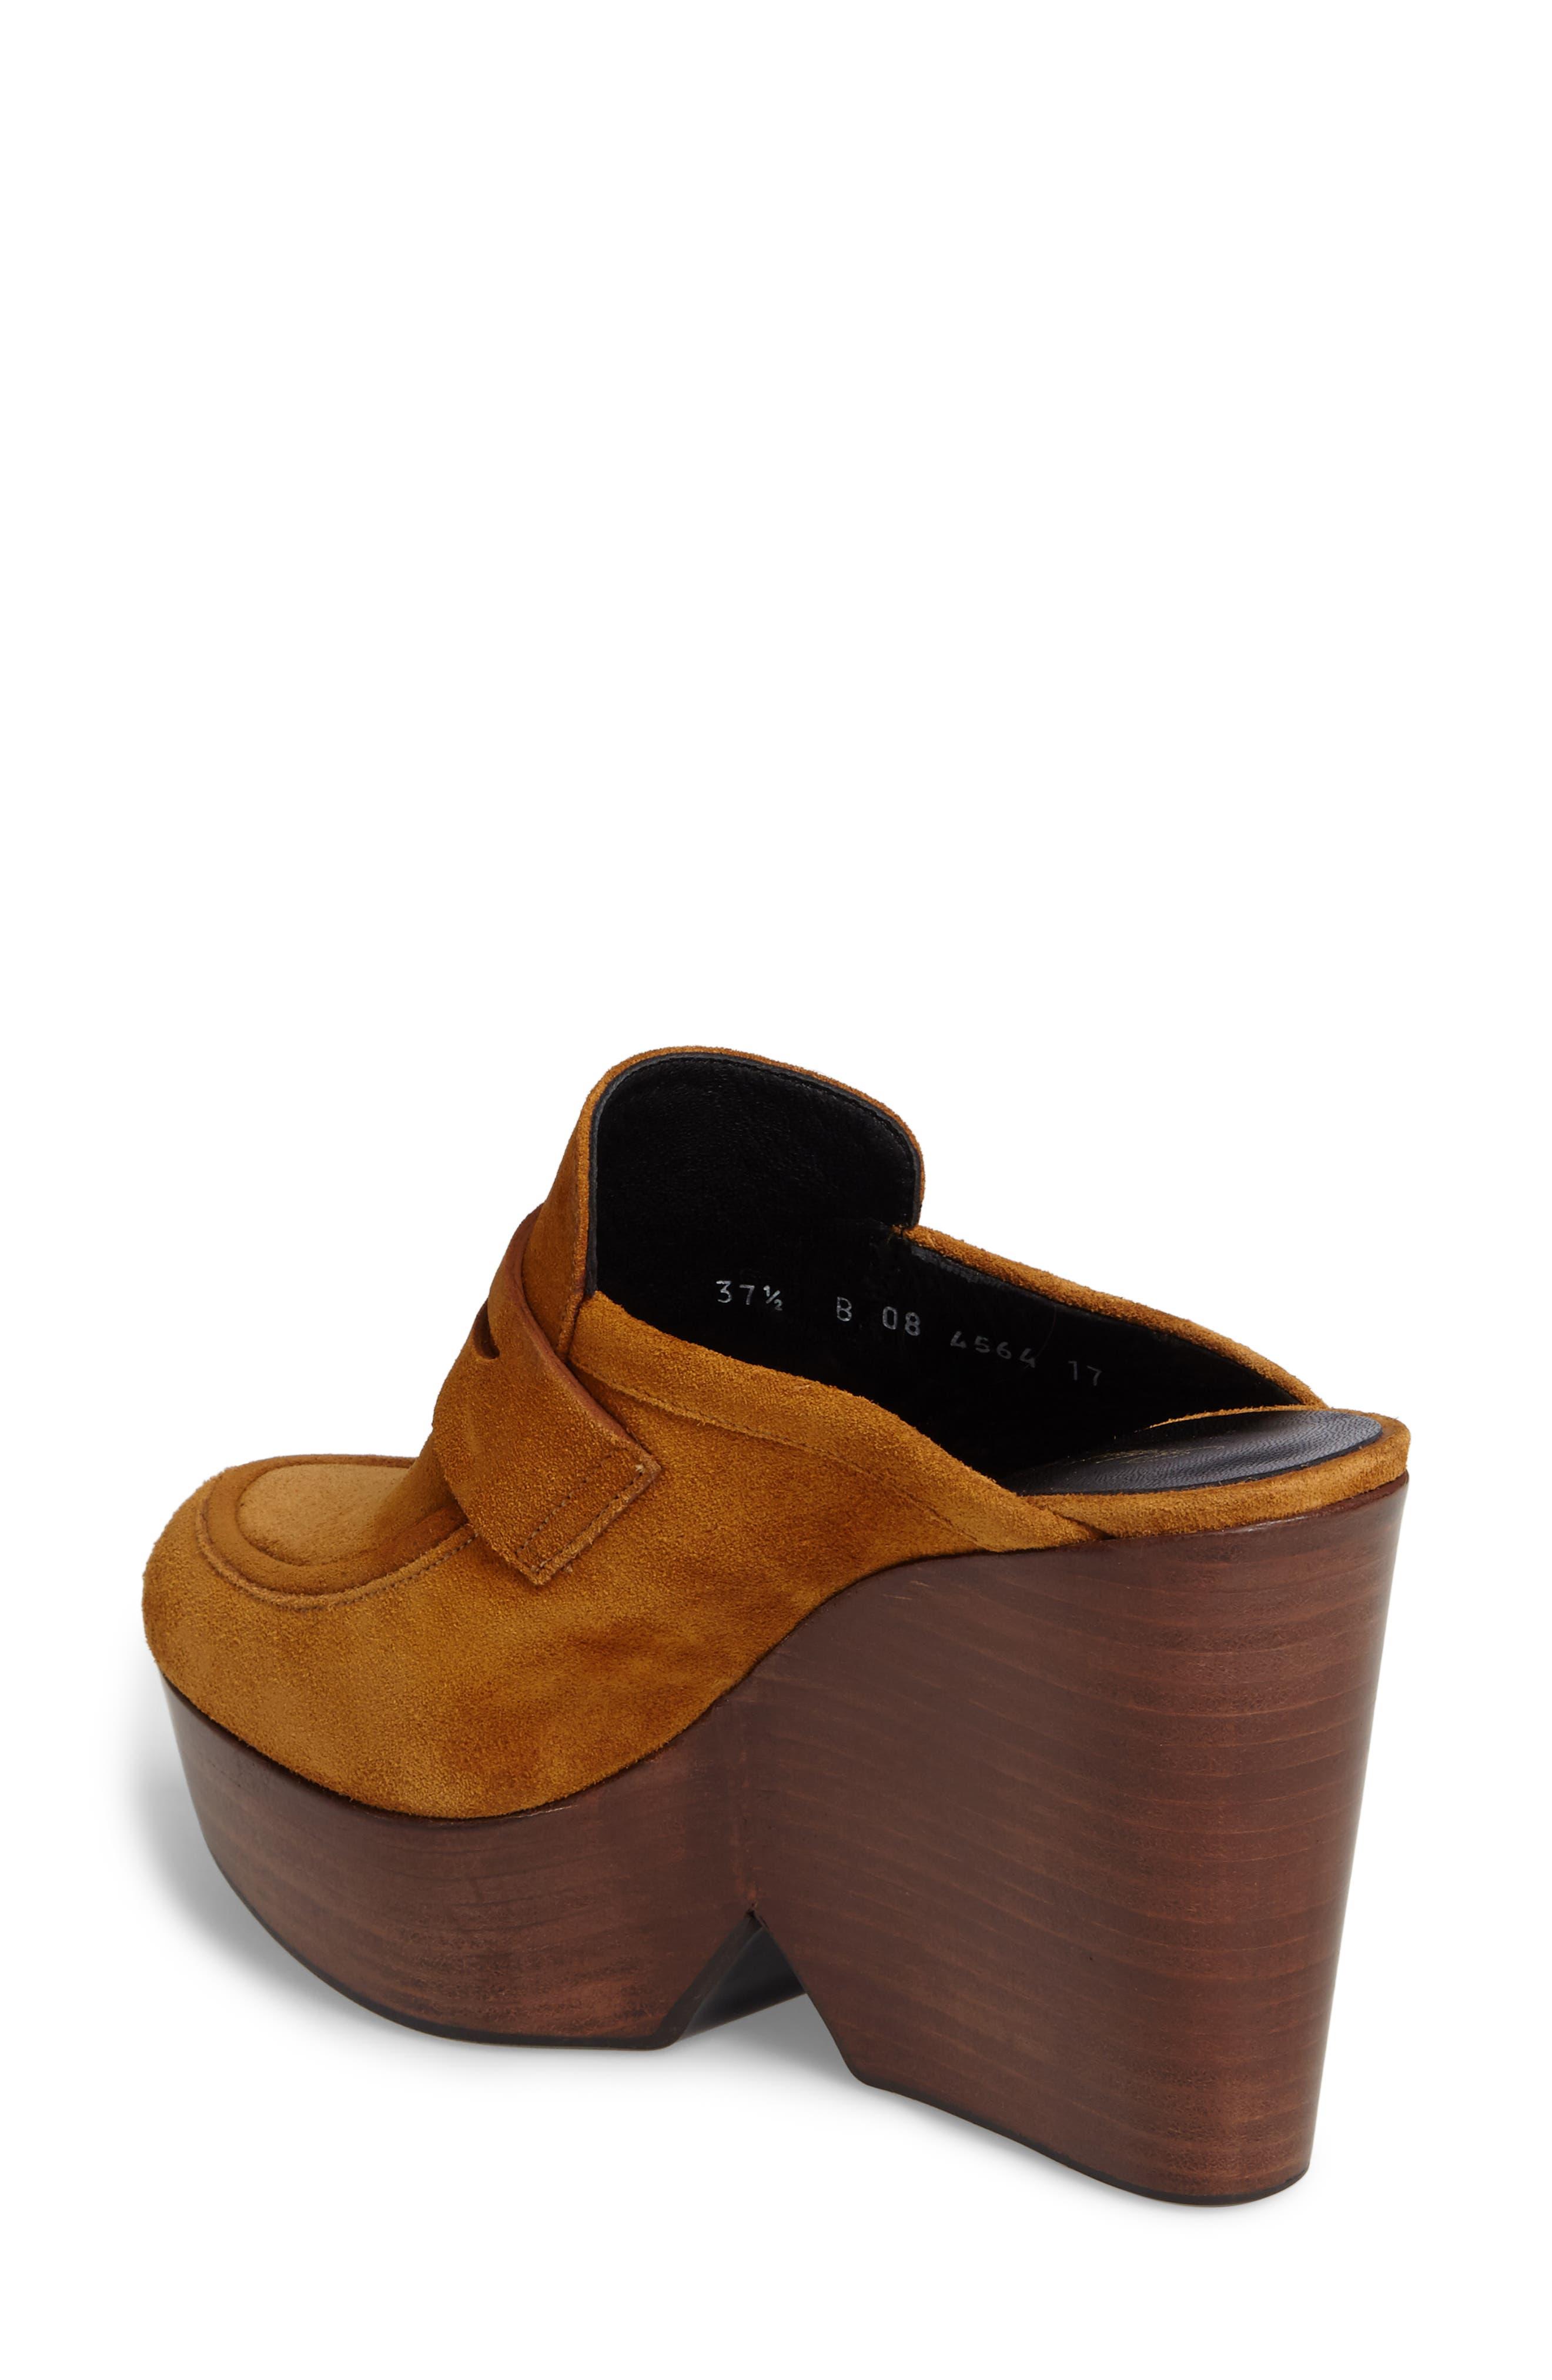 Alternate Image 2  - Robert Clergerie Damor Platform Loafer Mule (Women)